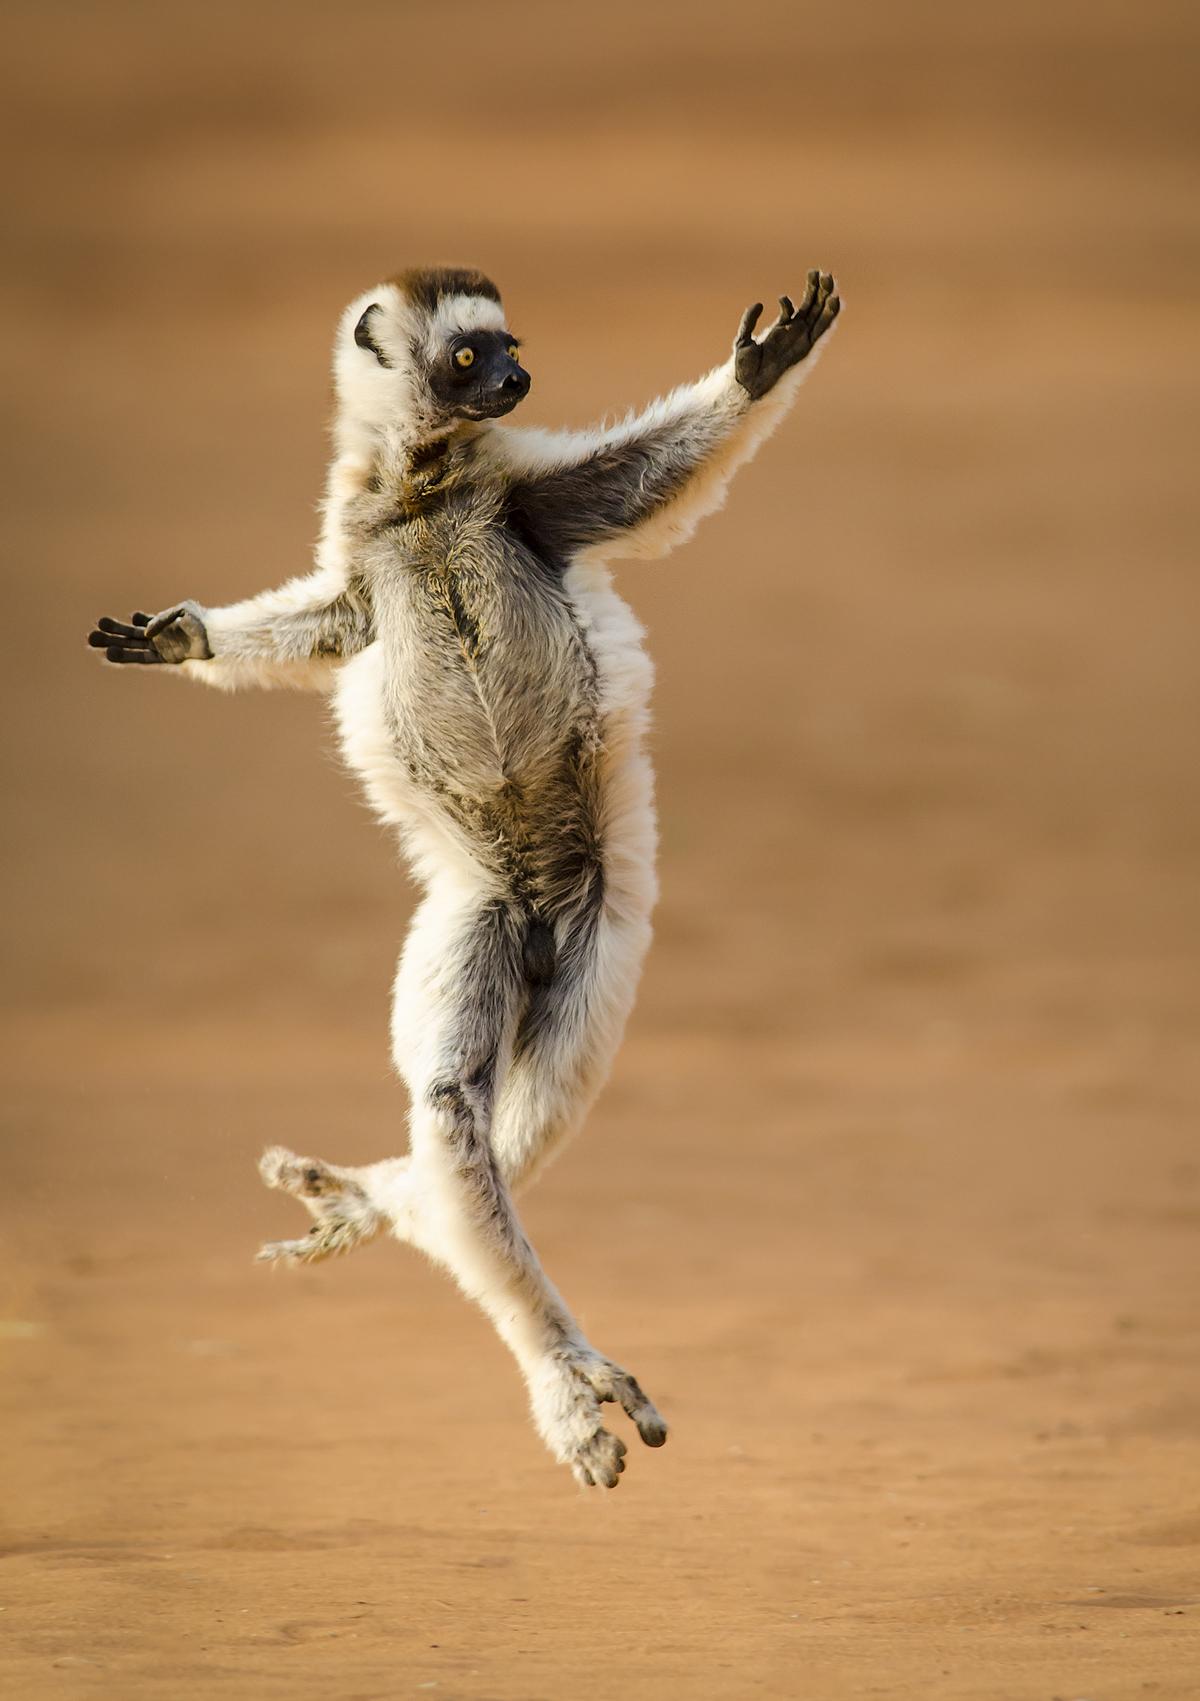 Diana_Rebman_Verreaux's Dancing Sifaka.jpg